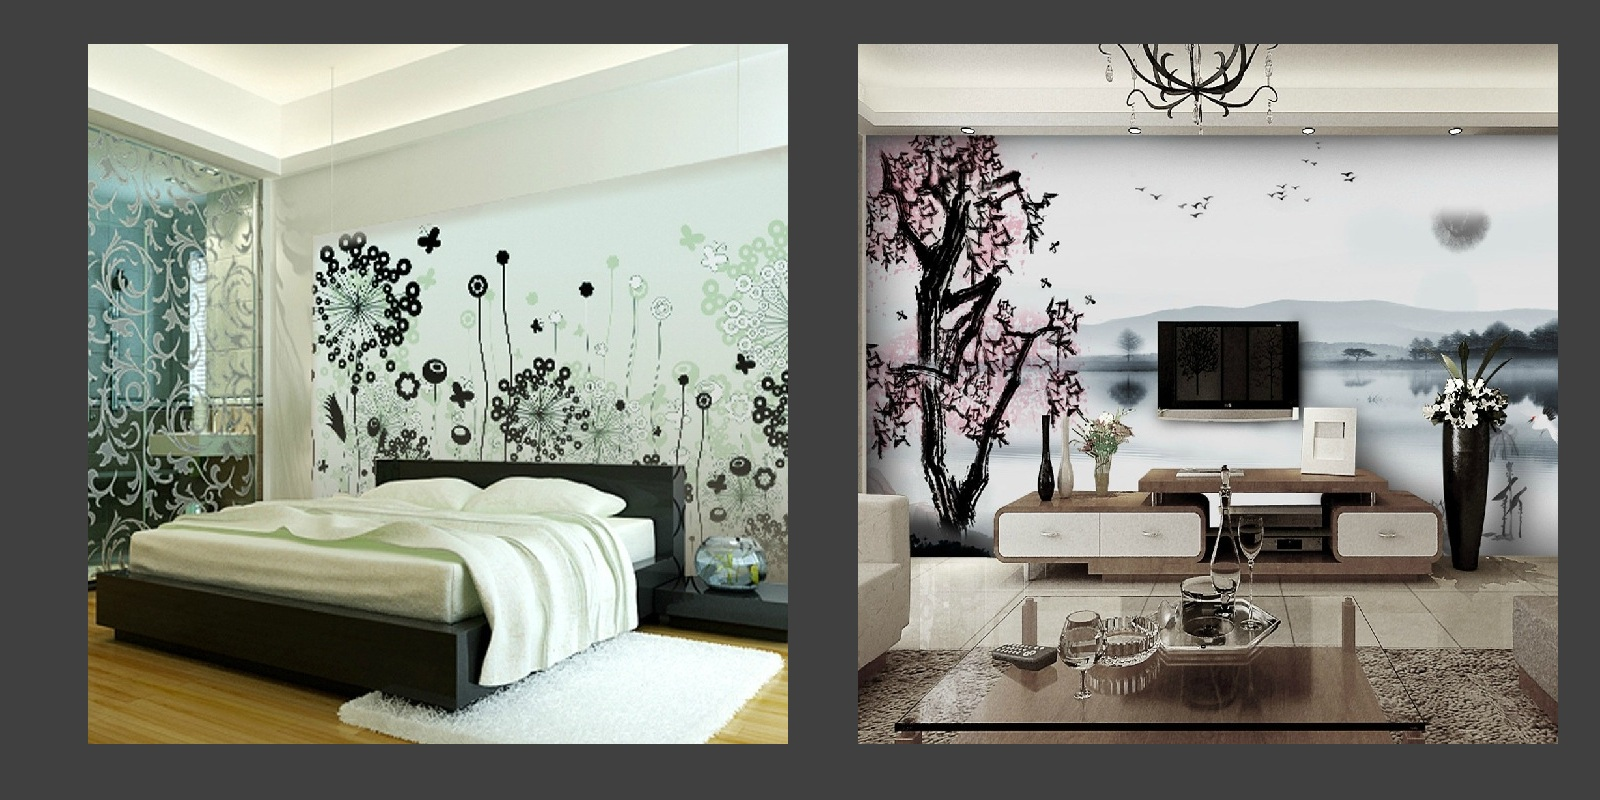 3d Wallpapers For Home Interiors Passende Strategien F 252 R Dekoideen Mit Mustern Wohnideen